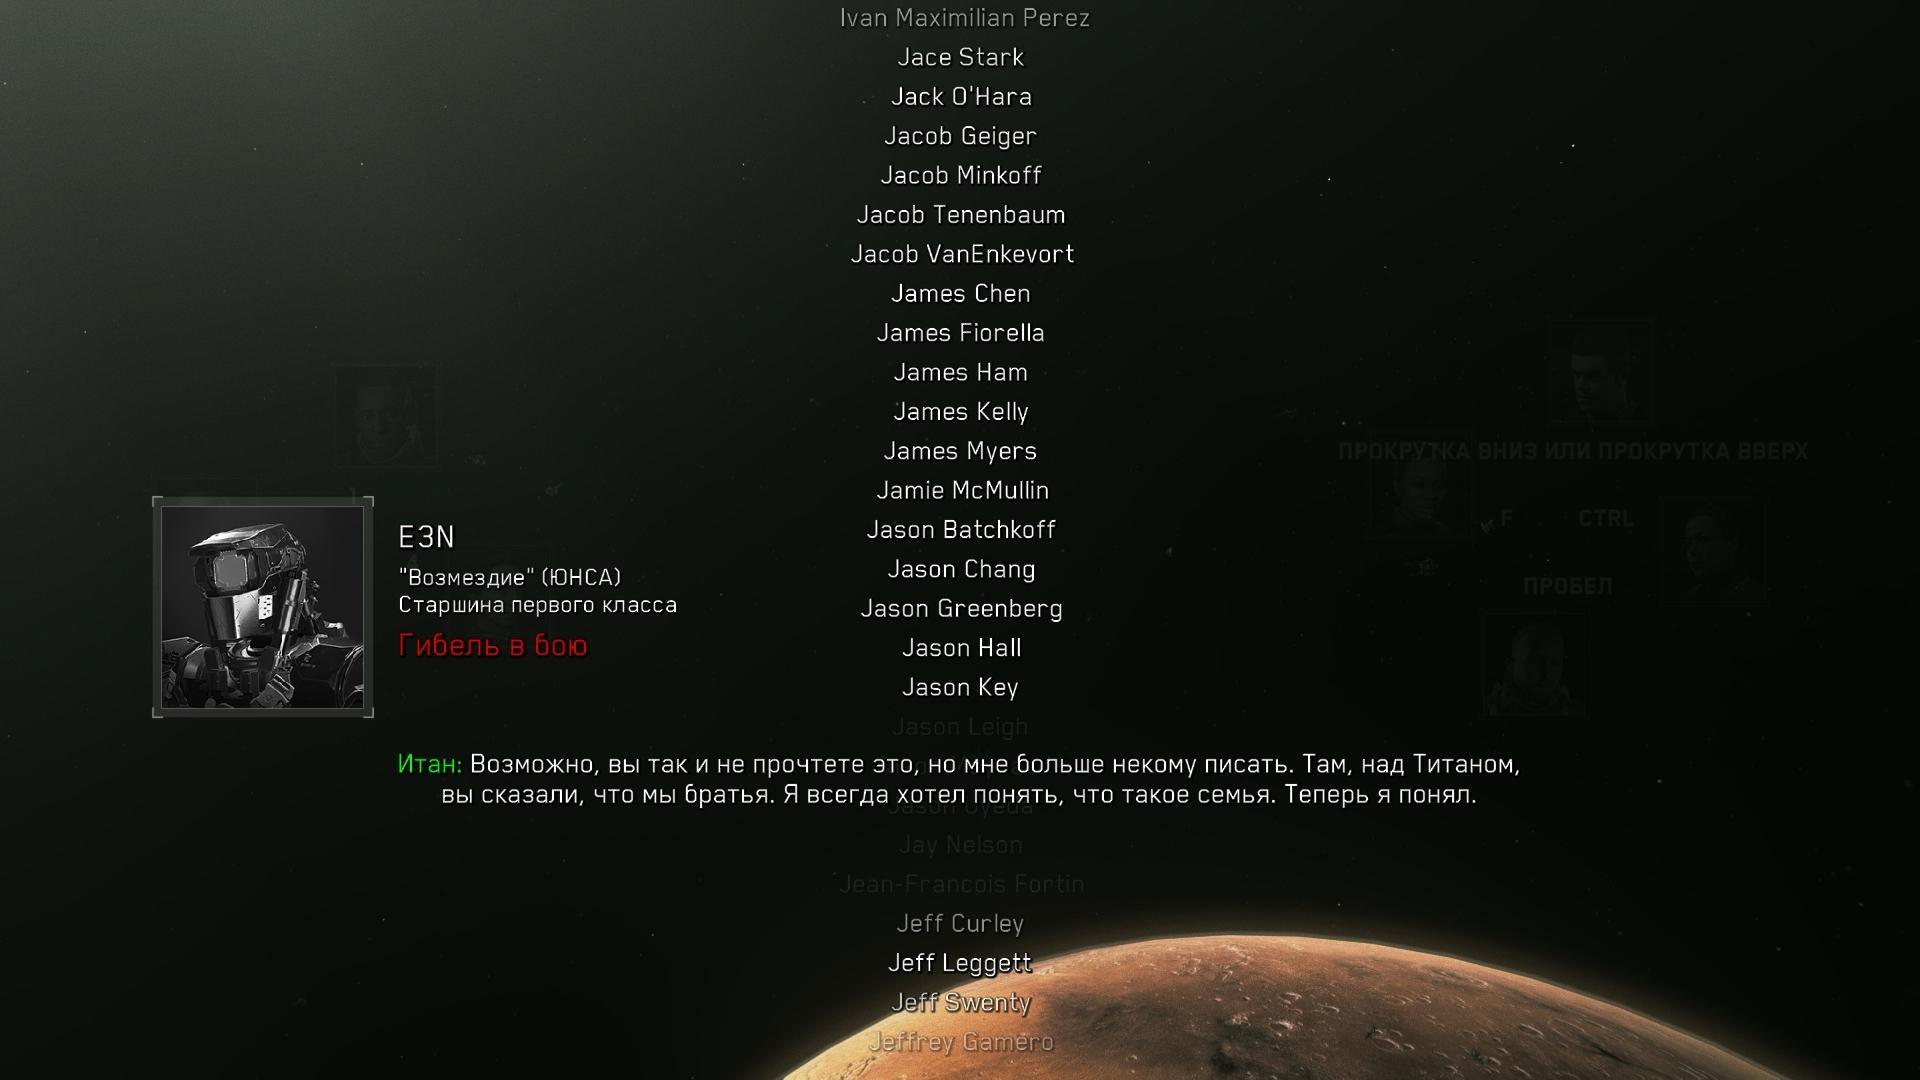 000136.Jpg - Call of Duty: Infinite Warfare